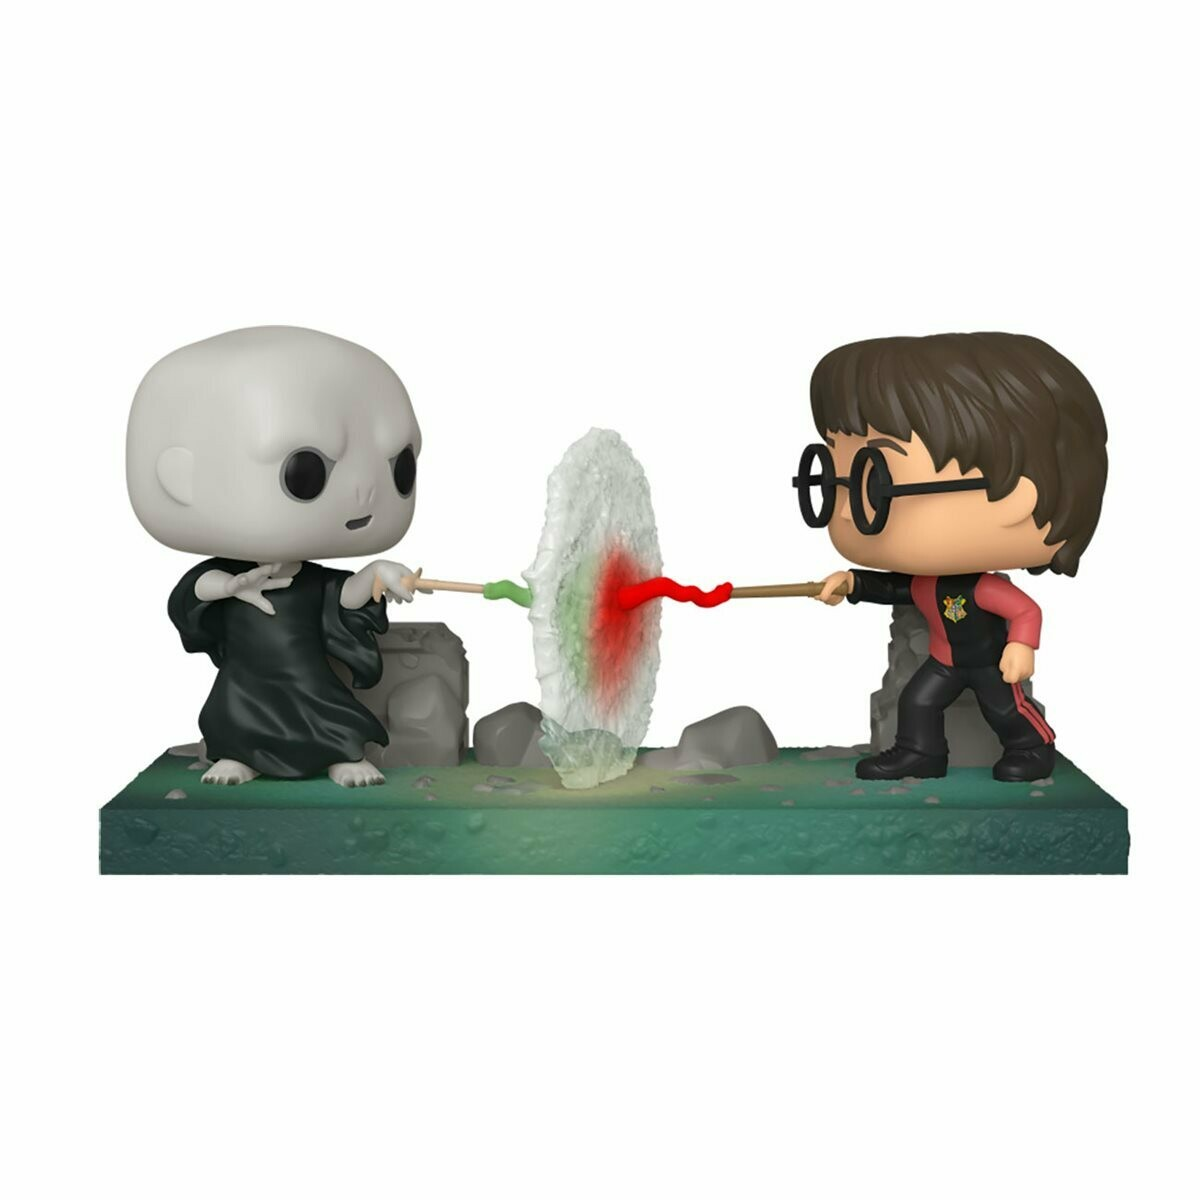 Harry Potter Harry vs. Voldemort Pop! Moment